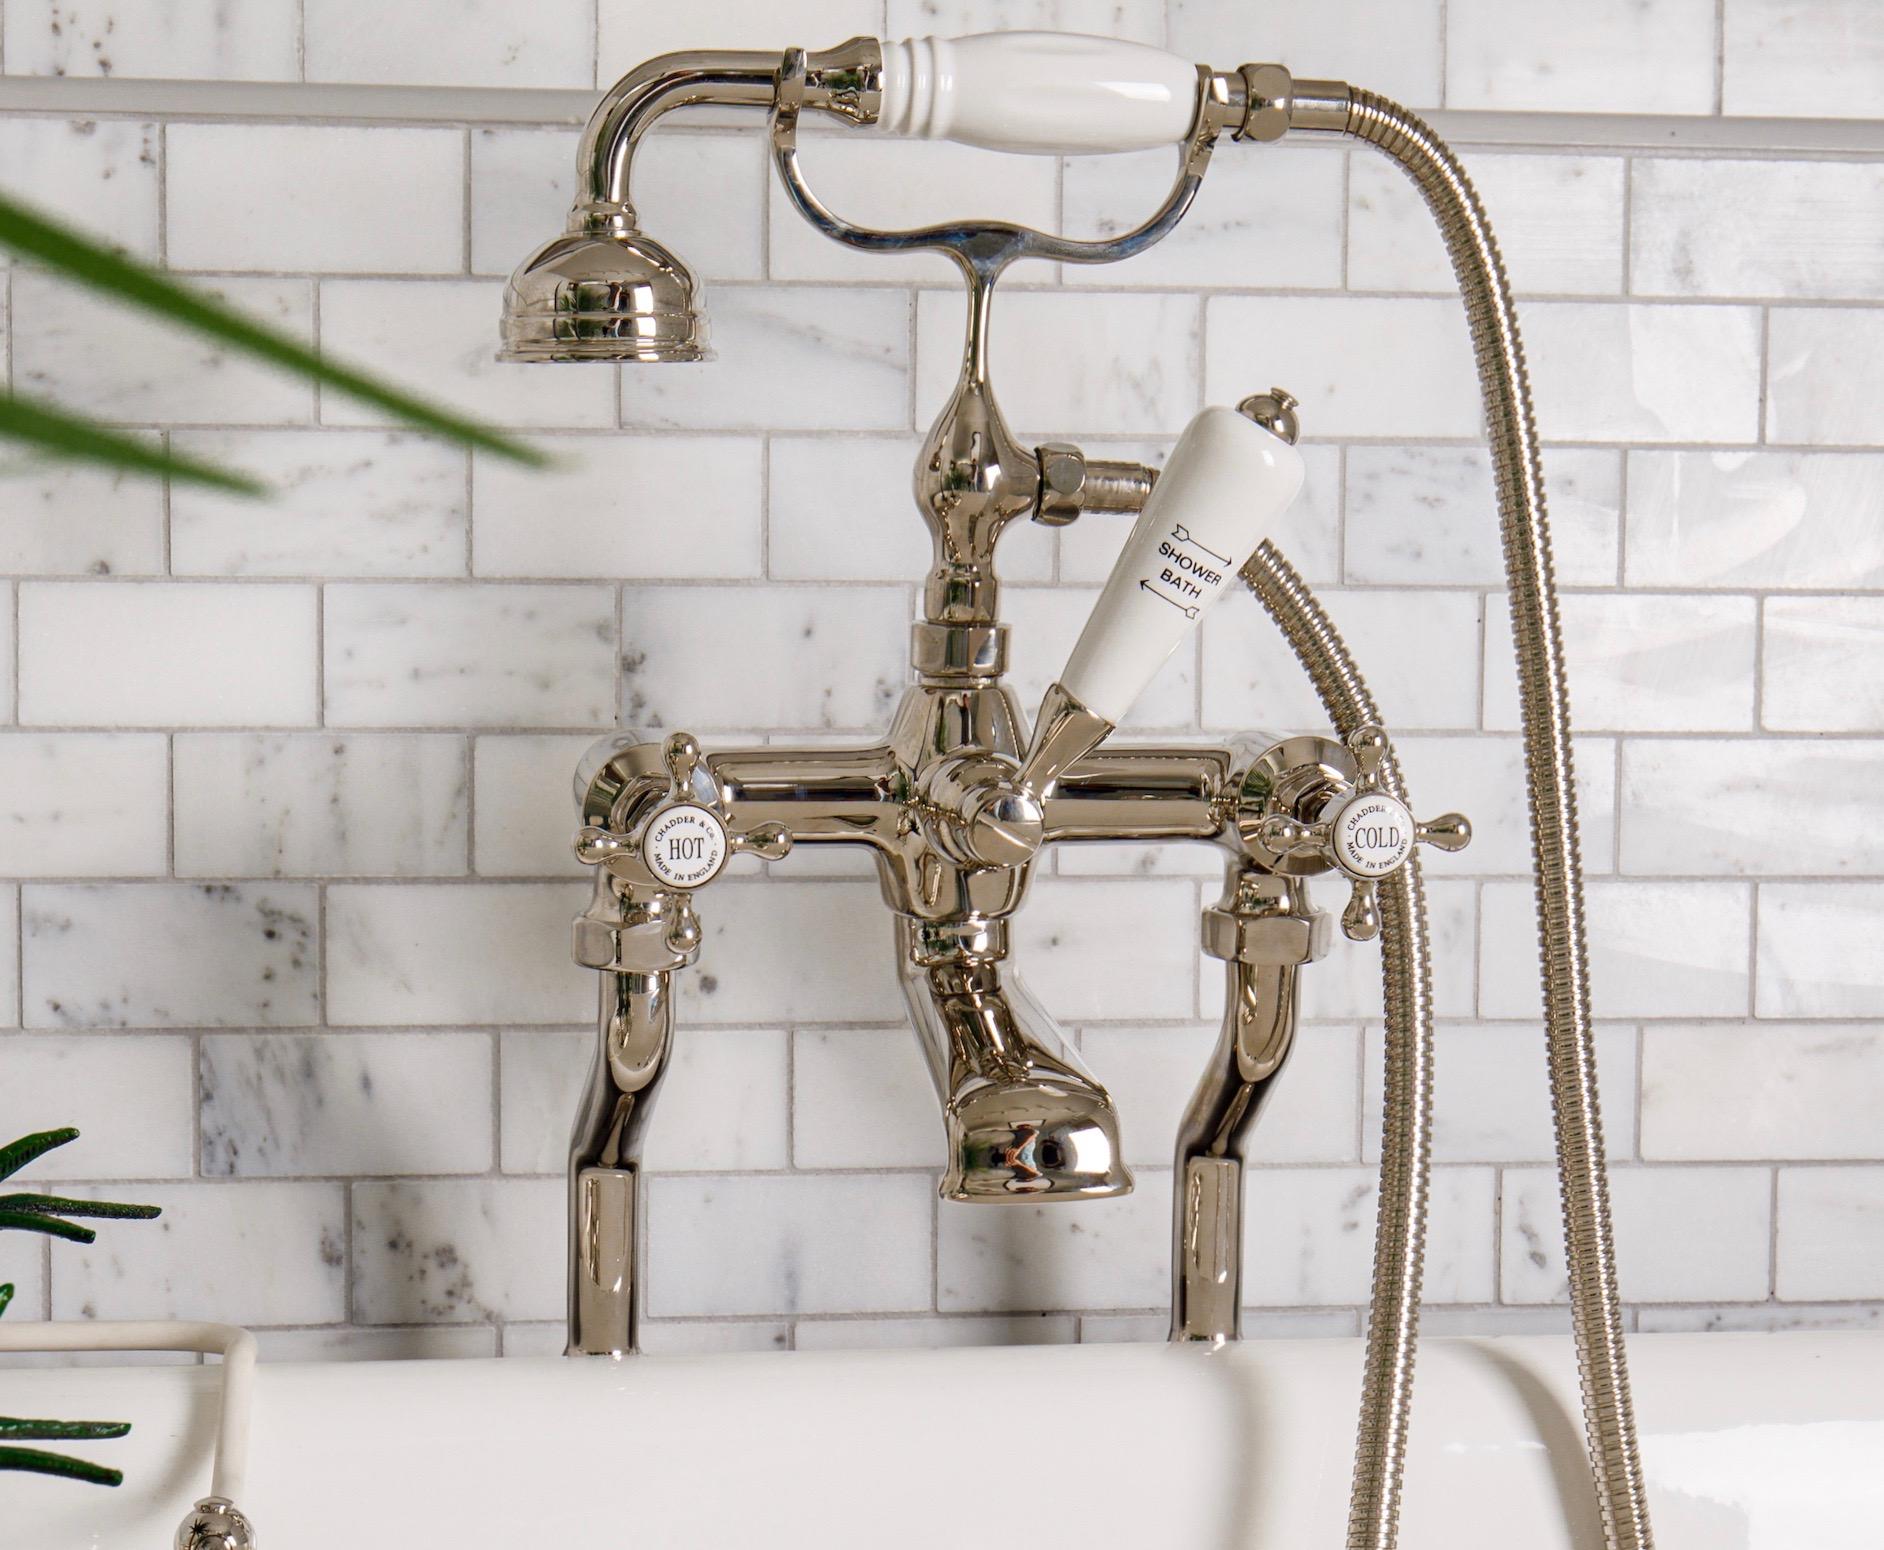 bath taps bath filler bath mixer nickel faucets shower